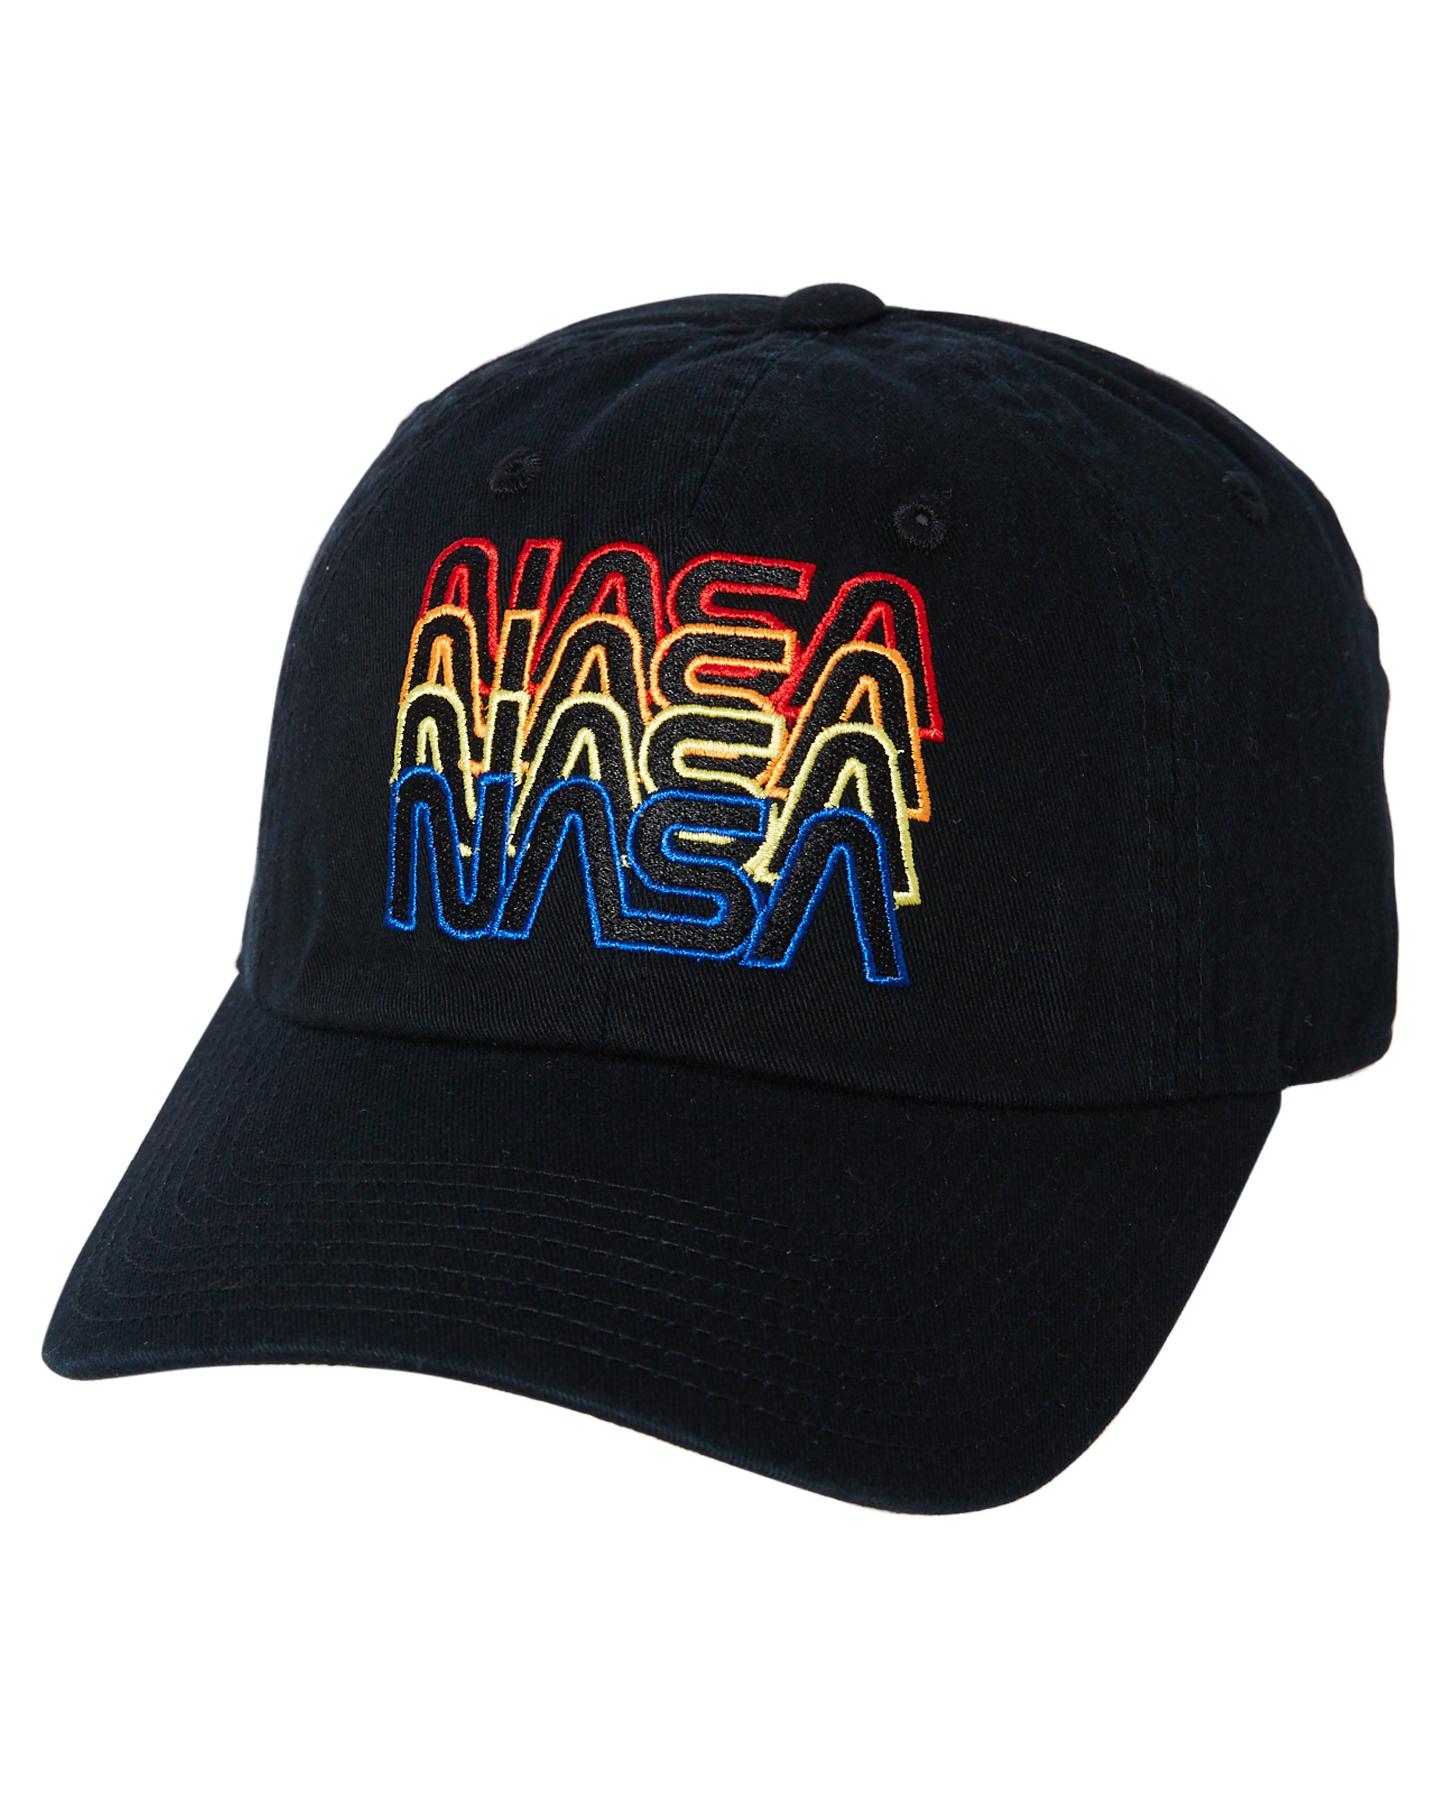 American Needle Neo Radar Ball Park Cap Black